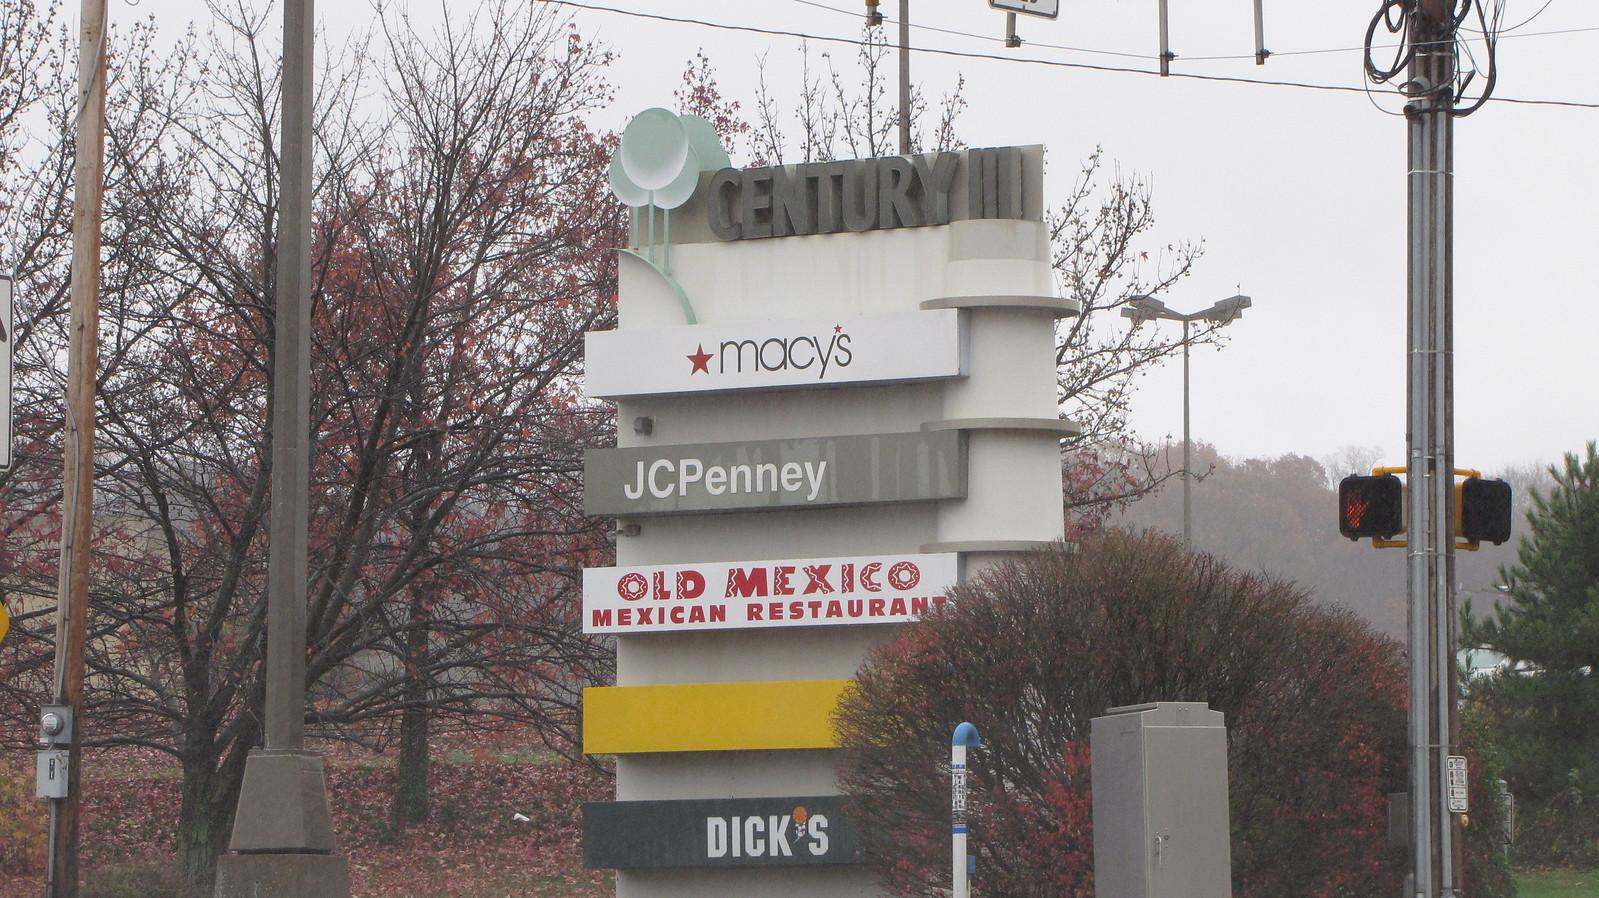 Century Iii Mall West Mifflin Pittsburgh Pa Flickr